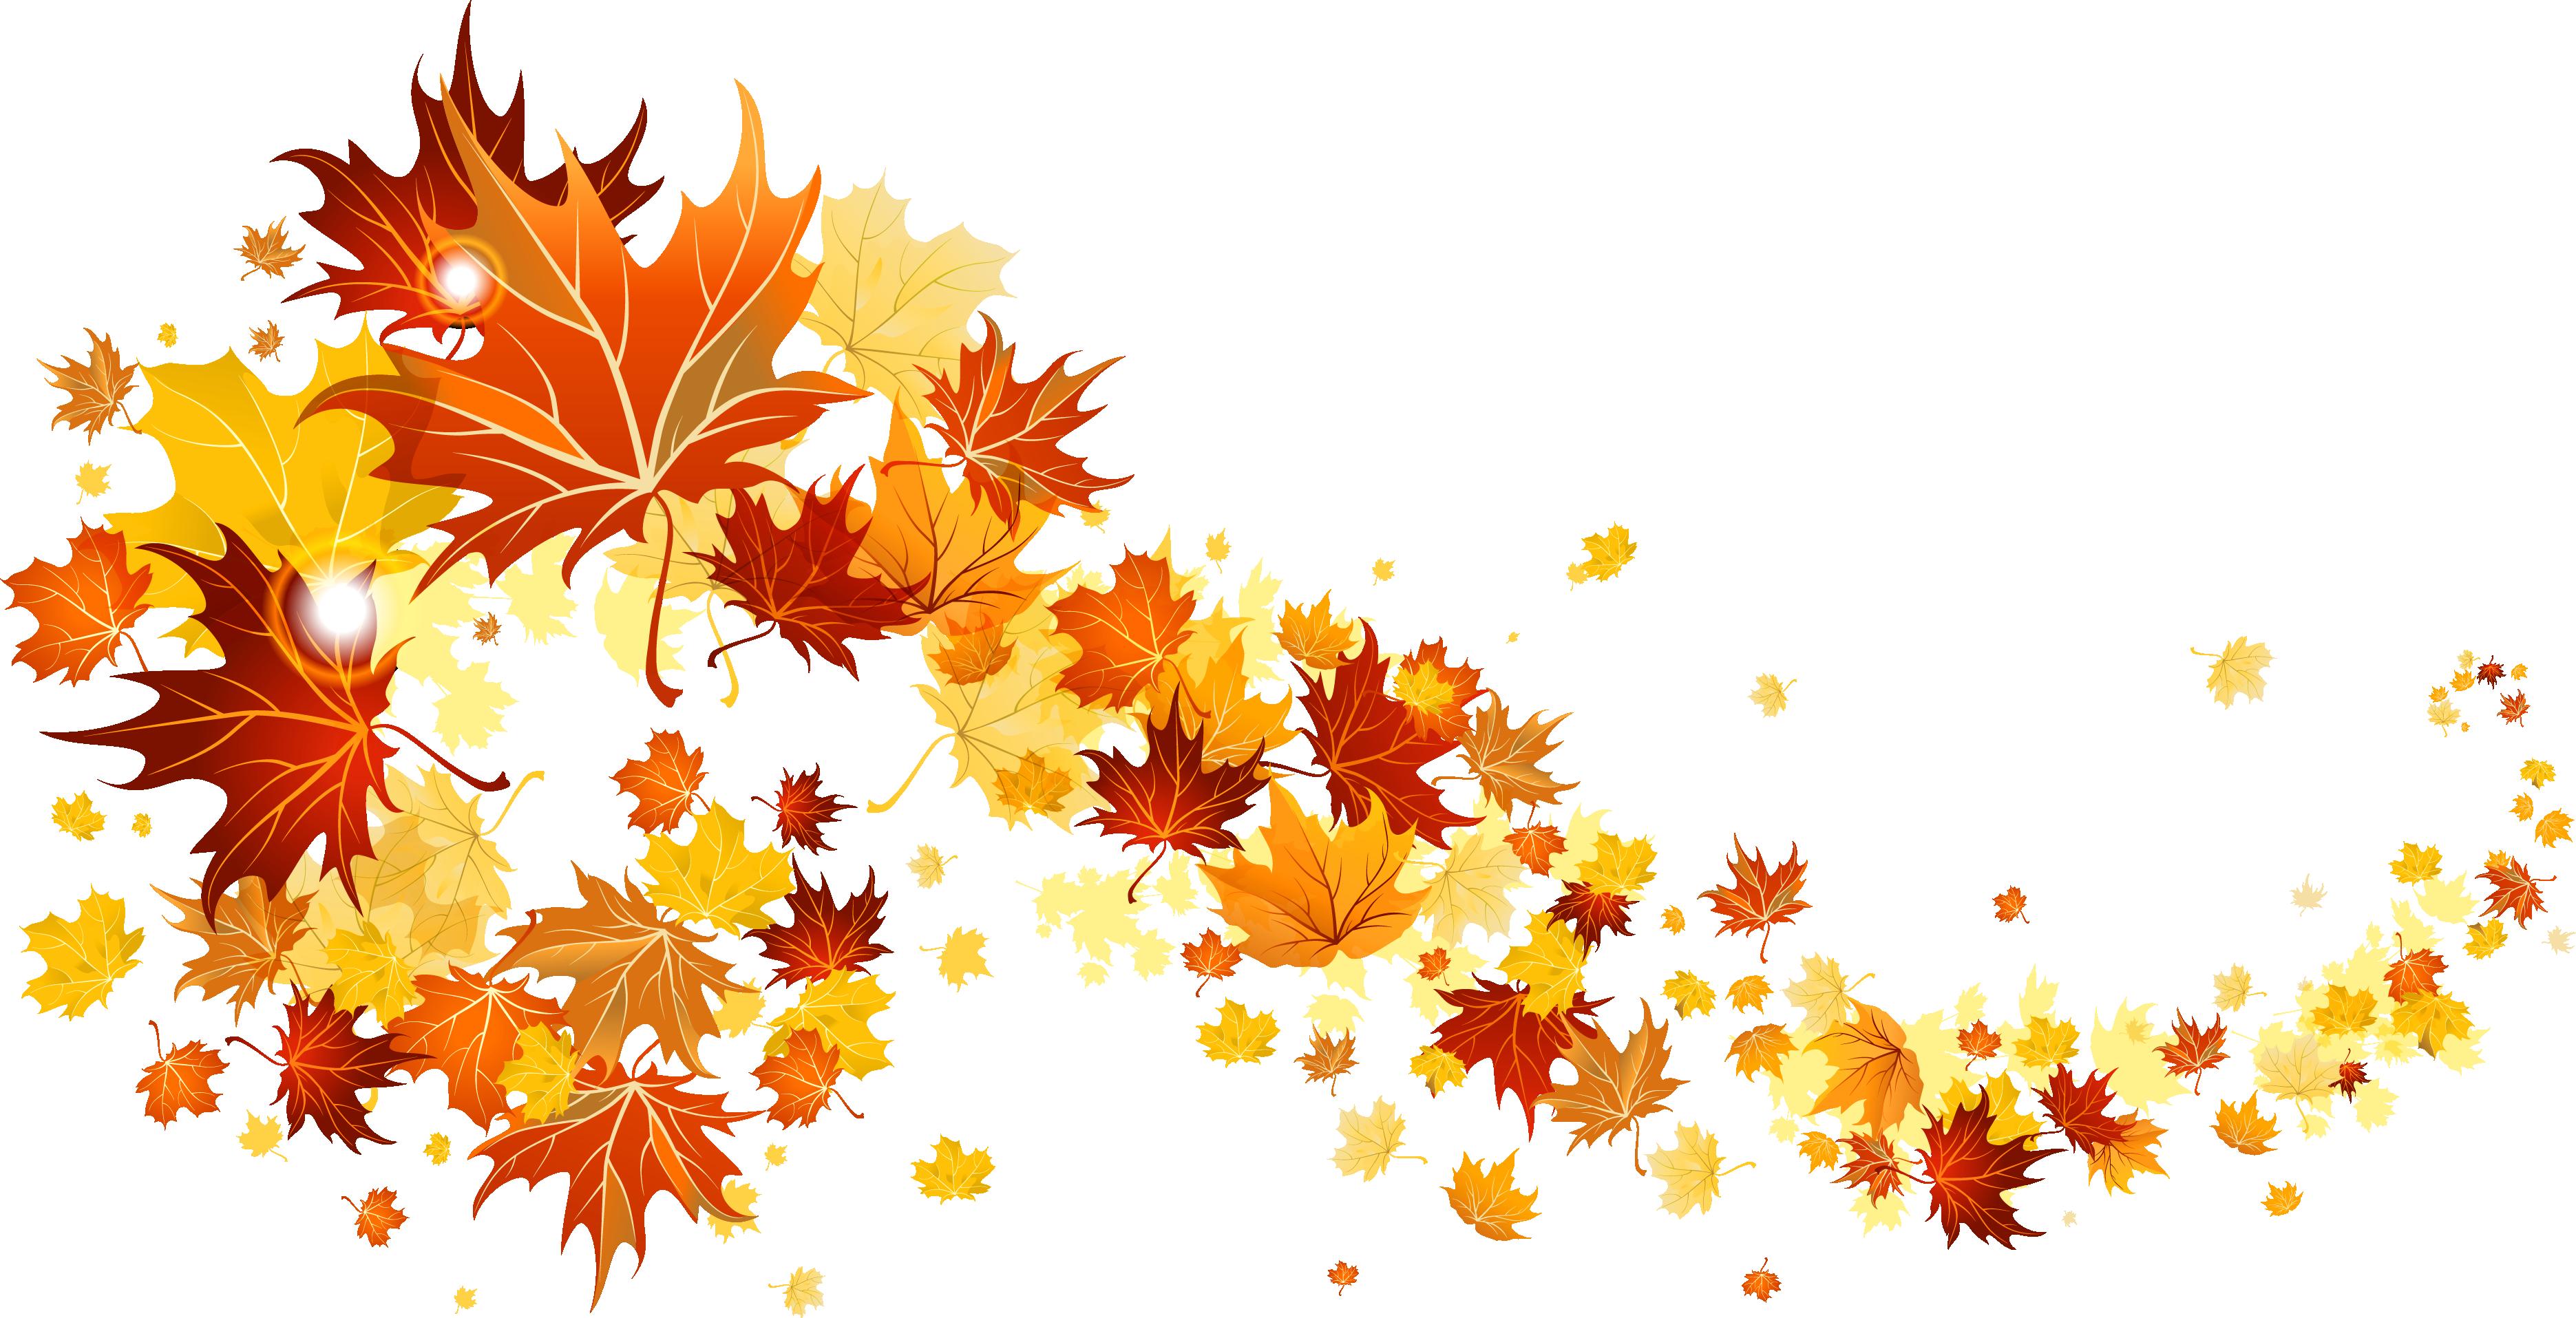 Download Falling Leaves Transparent HQ PNG Image | FreePNGImg